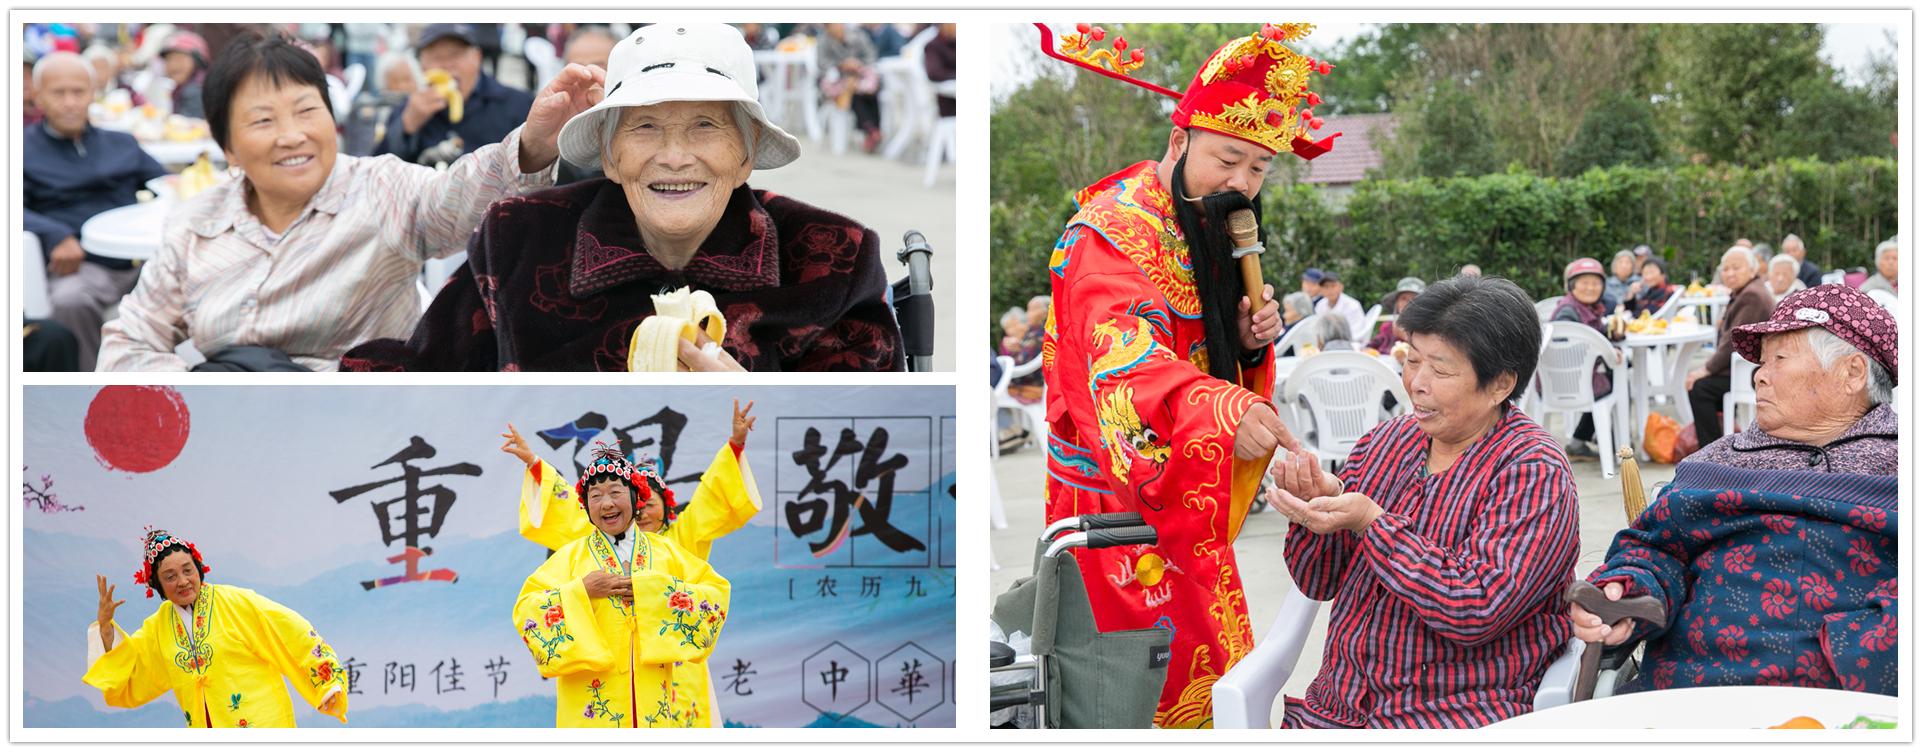 Rugao celebrates Chongyang Festival